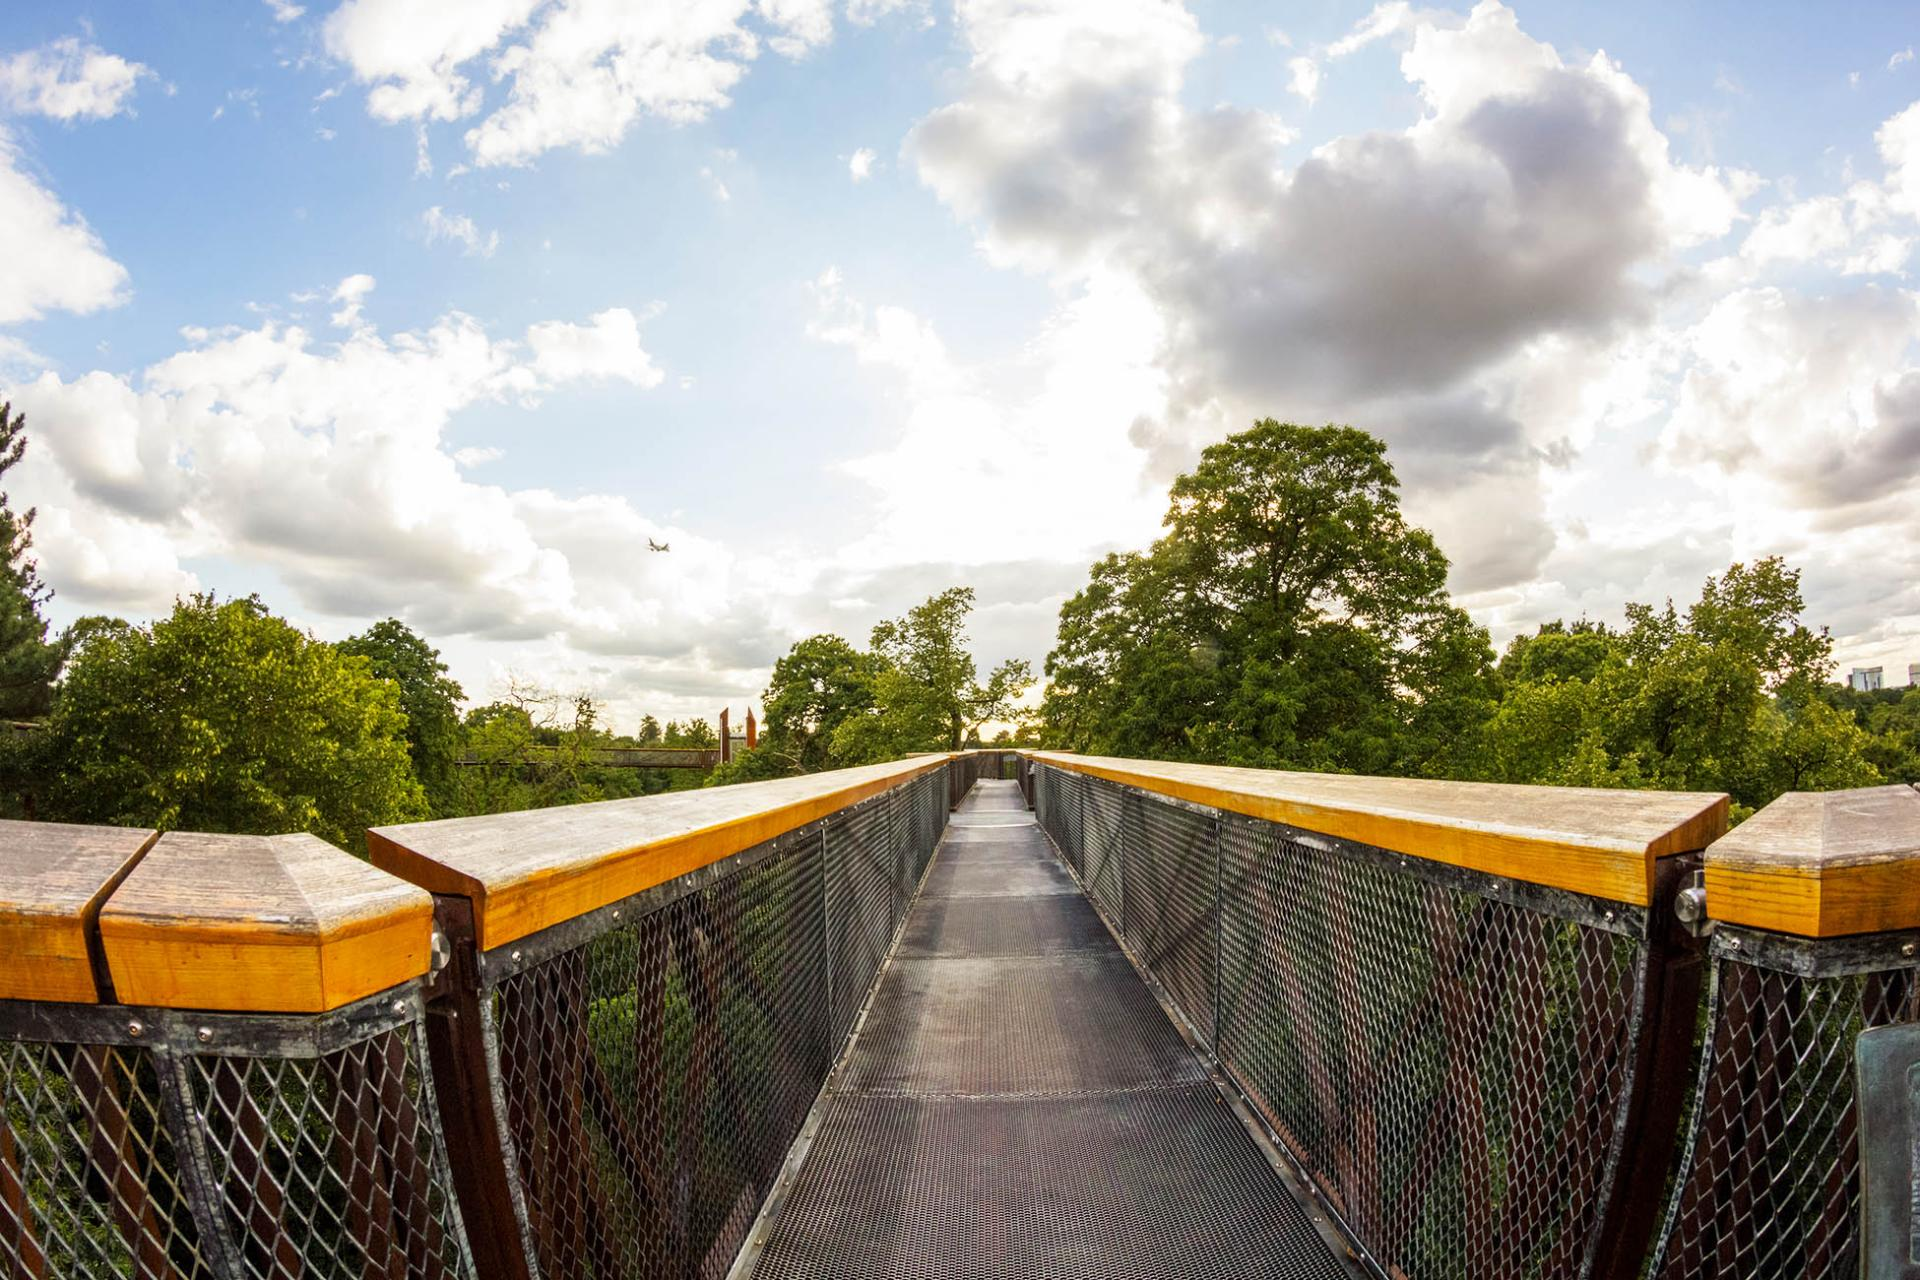 Jardin Botanico de Londres –plataformas elevadas